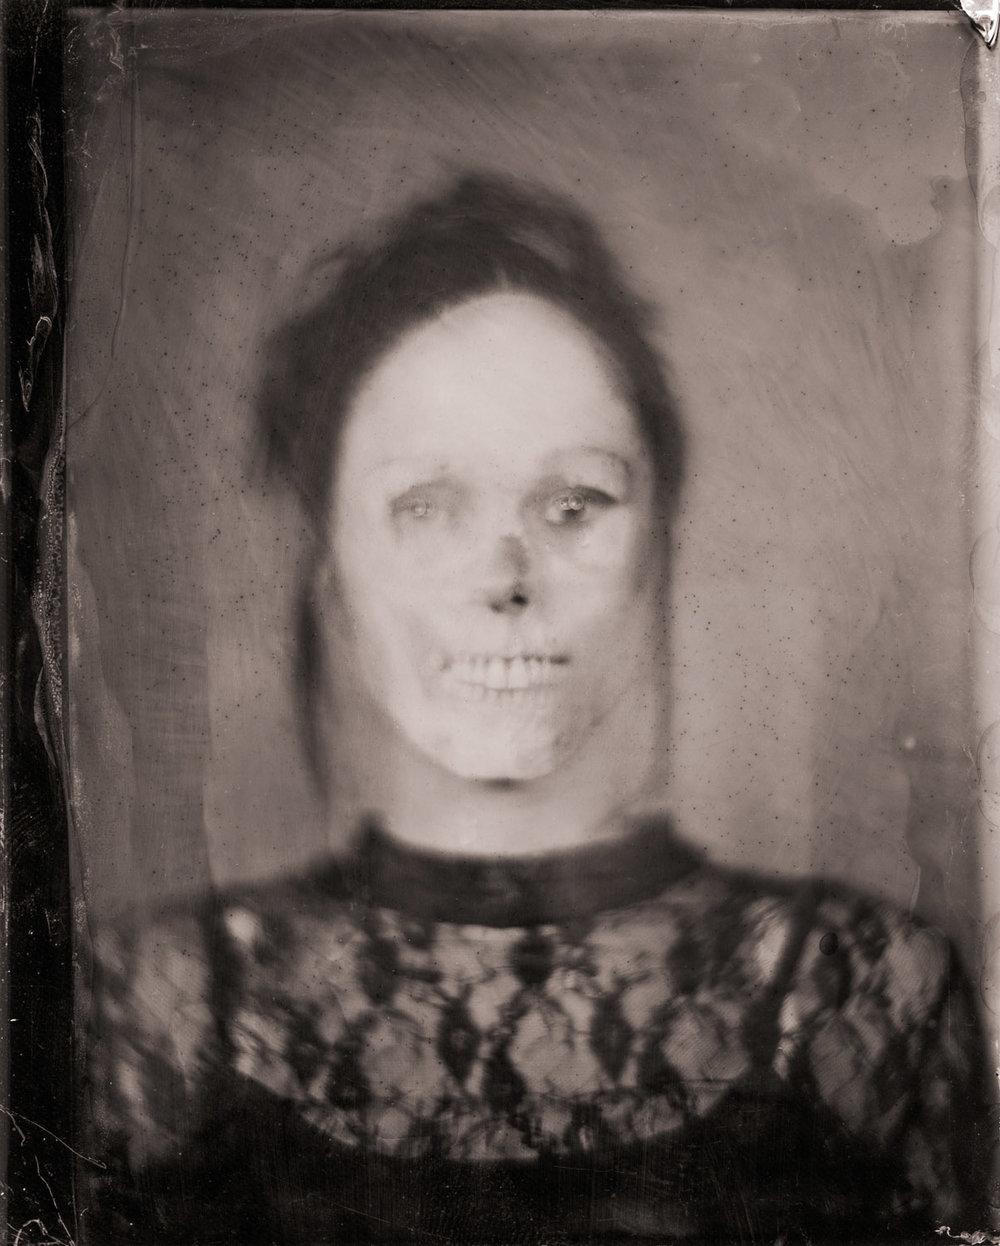 Emily - By:Joseph Gamble  www.josephgamble.com